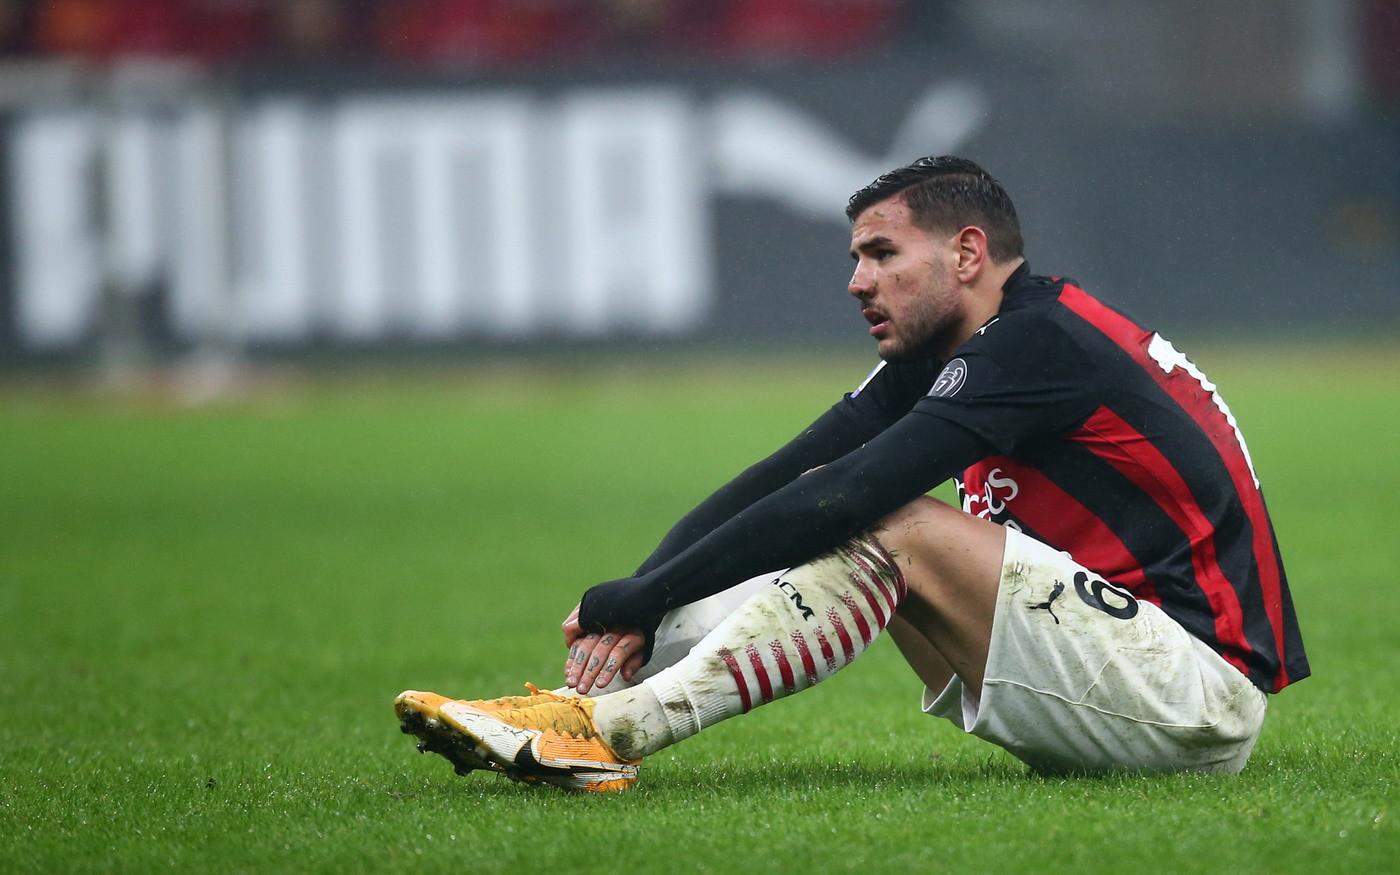 Serie A, gli squalificati: Milan senza Theo Hernandez a Benevento | News -  Sportmediaset